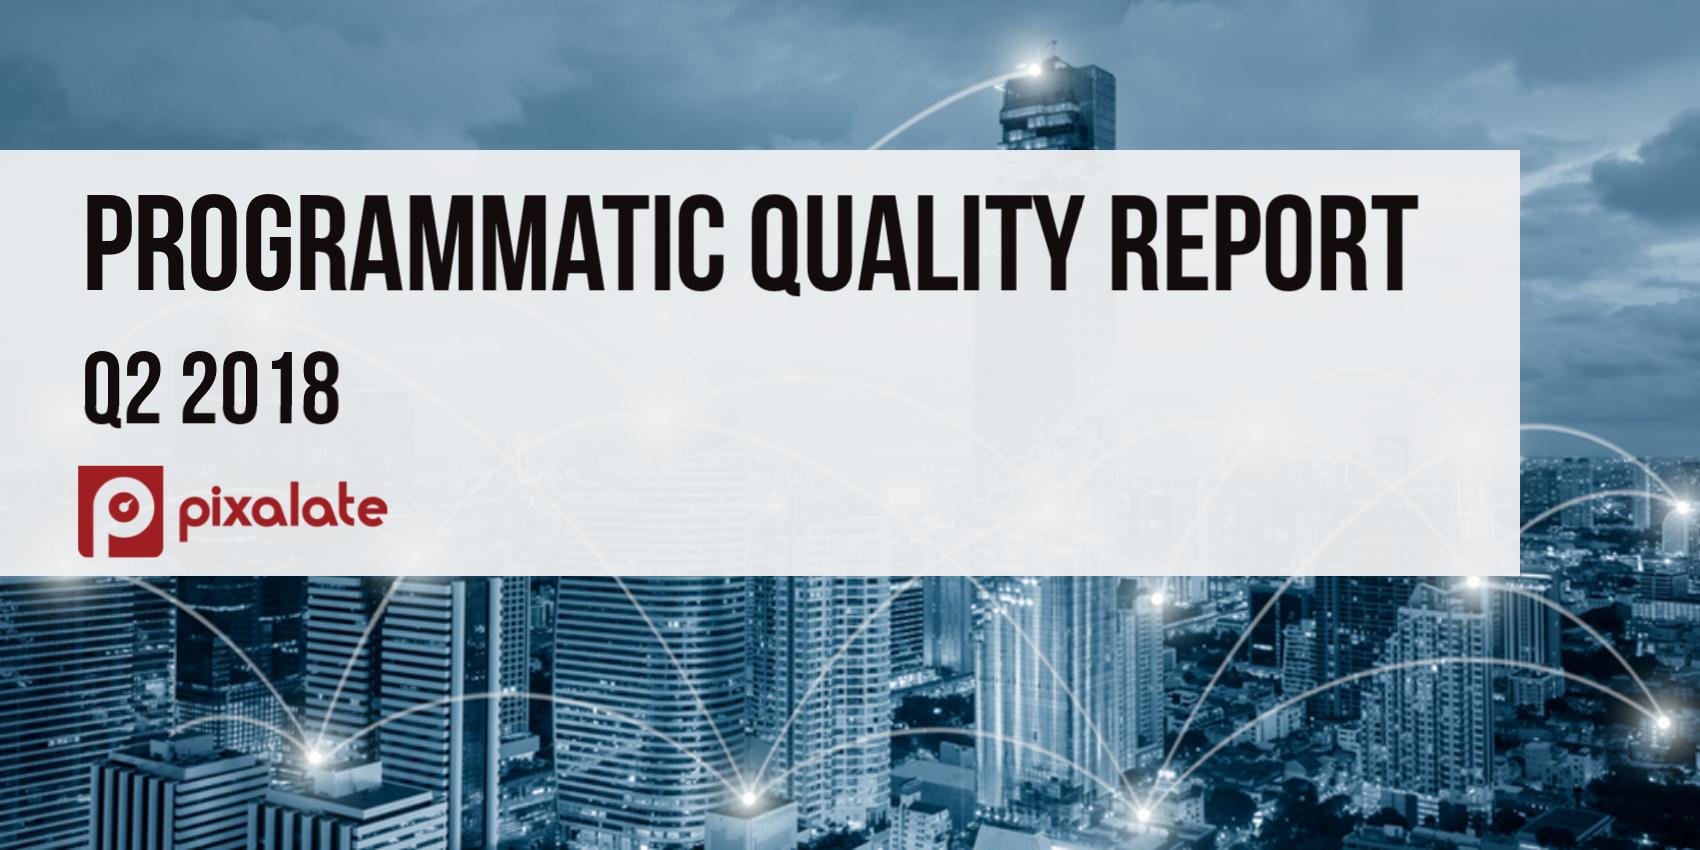 Q2-2018-programmatic-quality-report-image